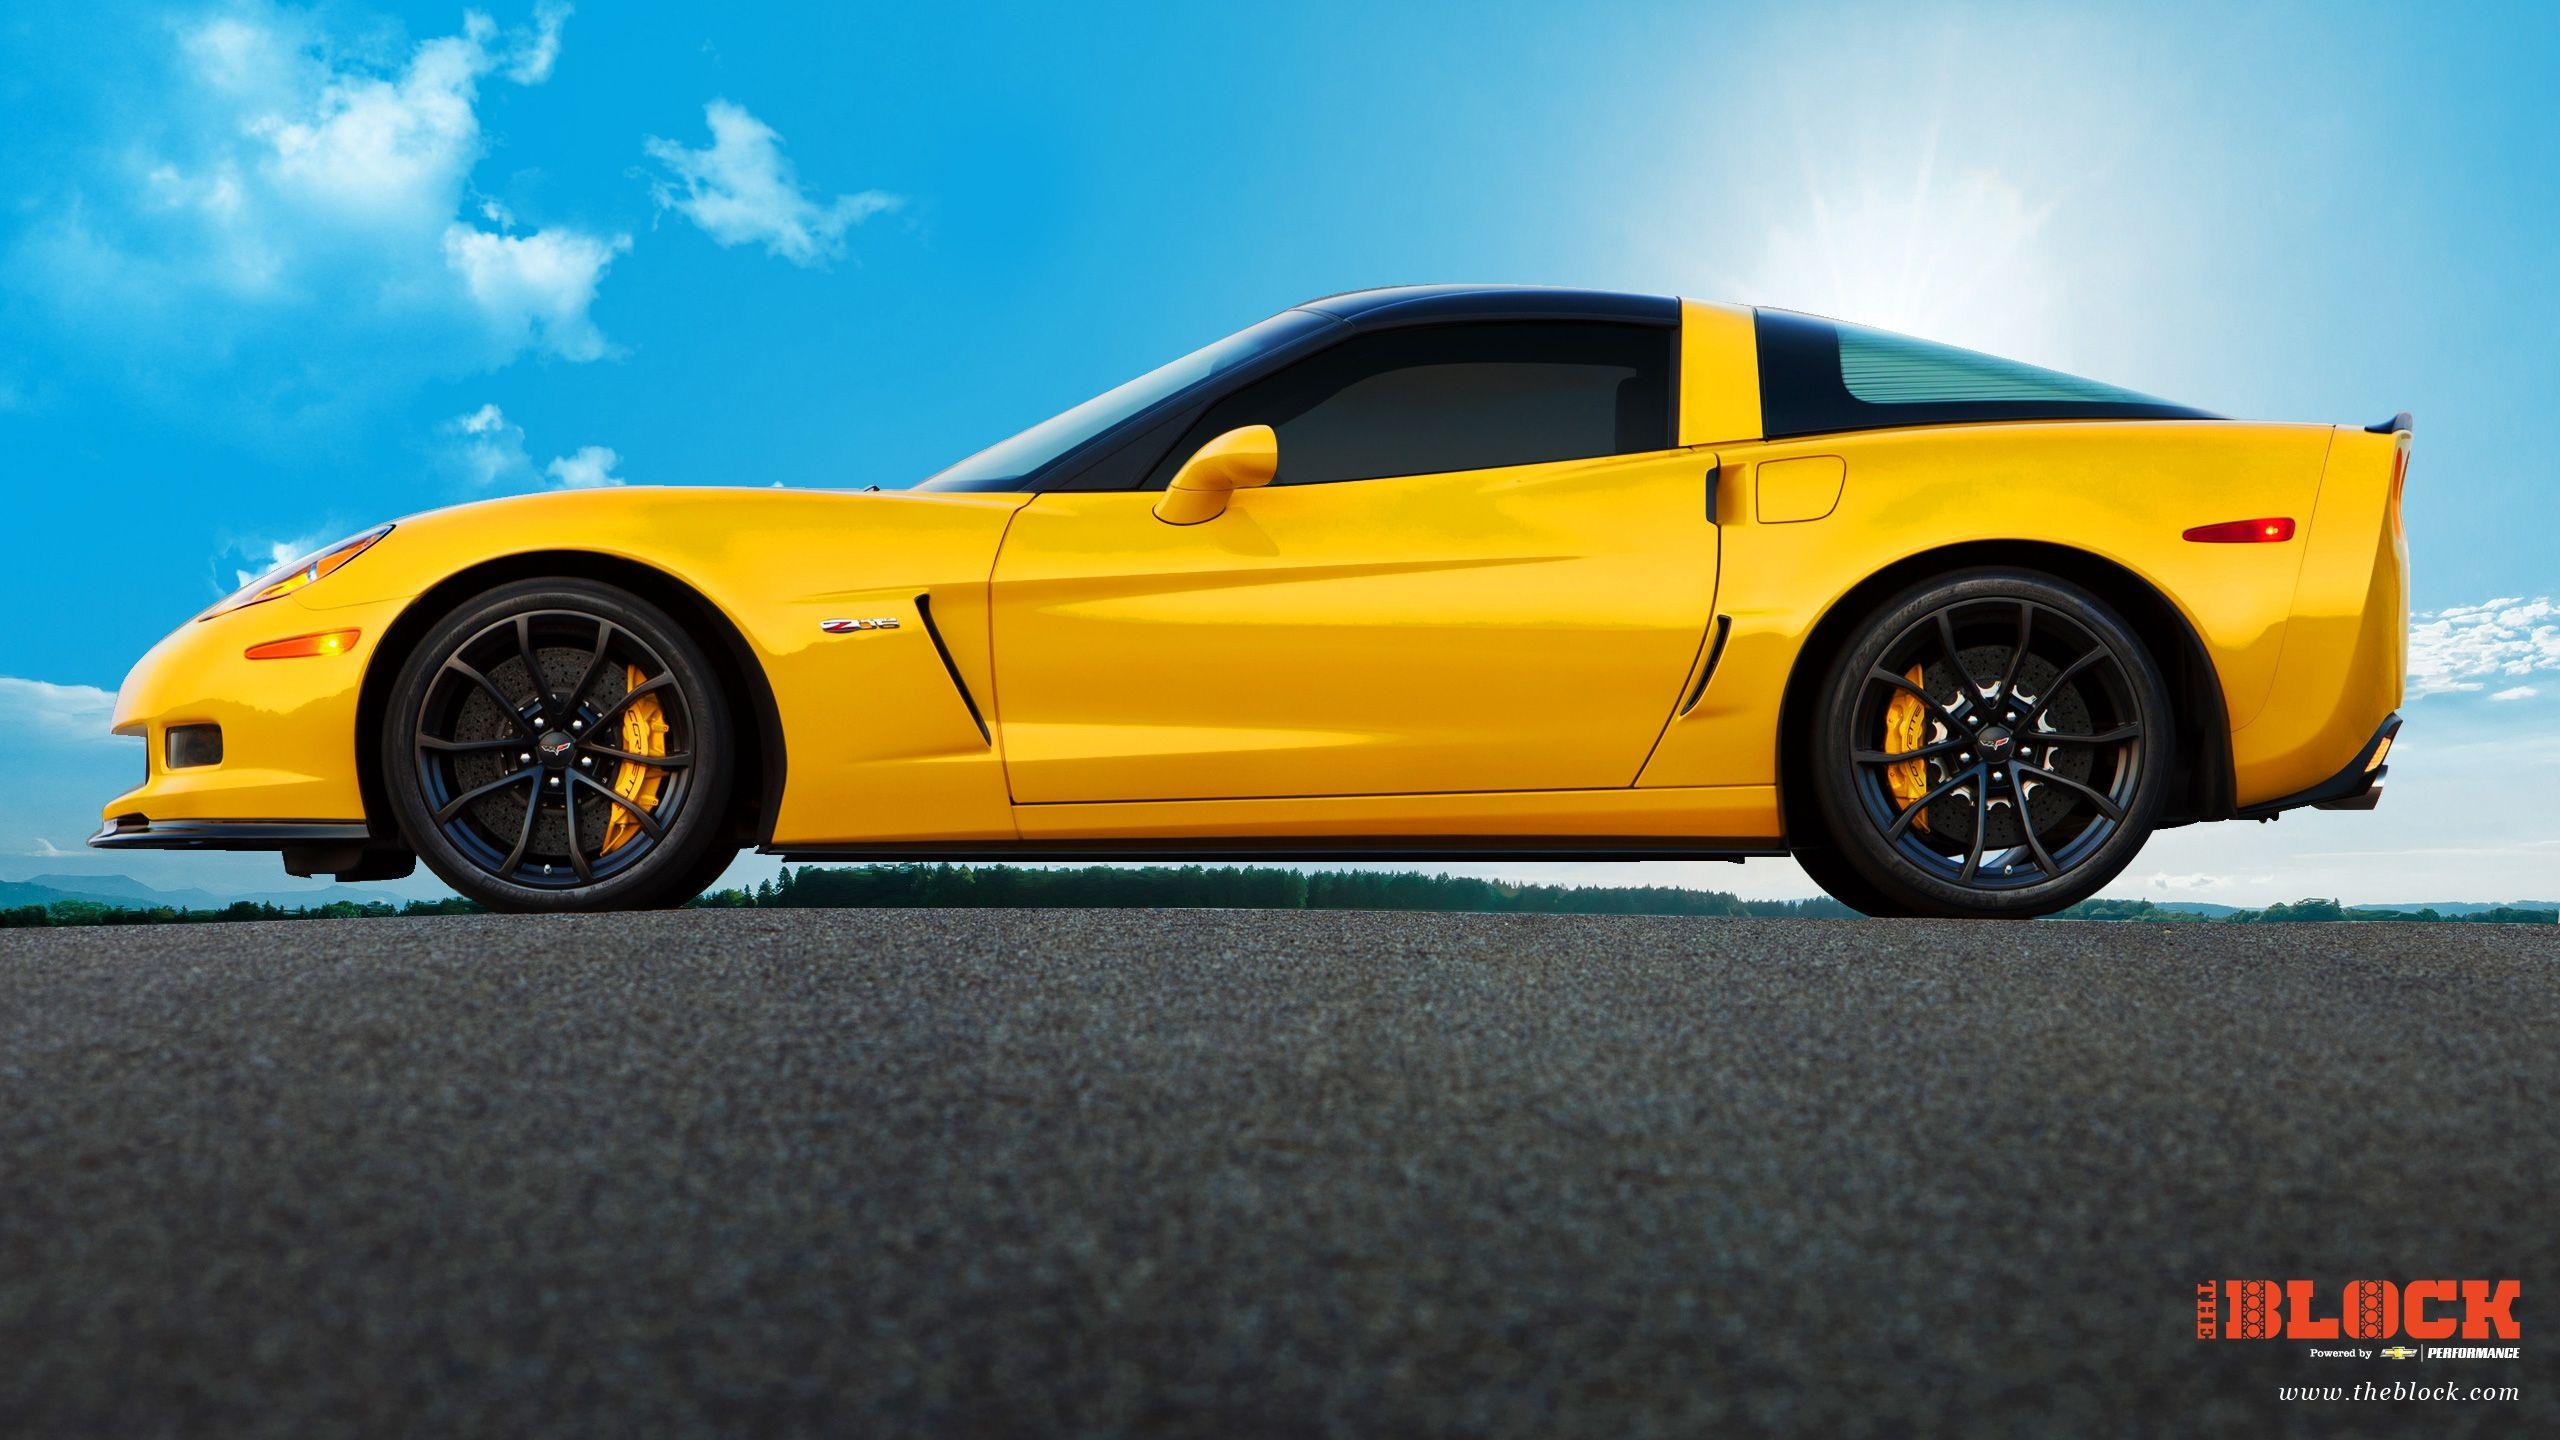 2013 Corvette Z06 2013 Corvette Corvette 2009 Corvette